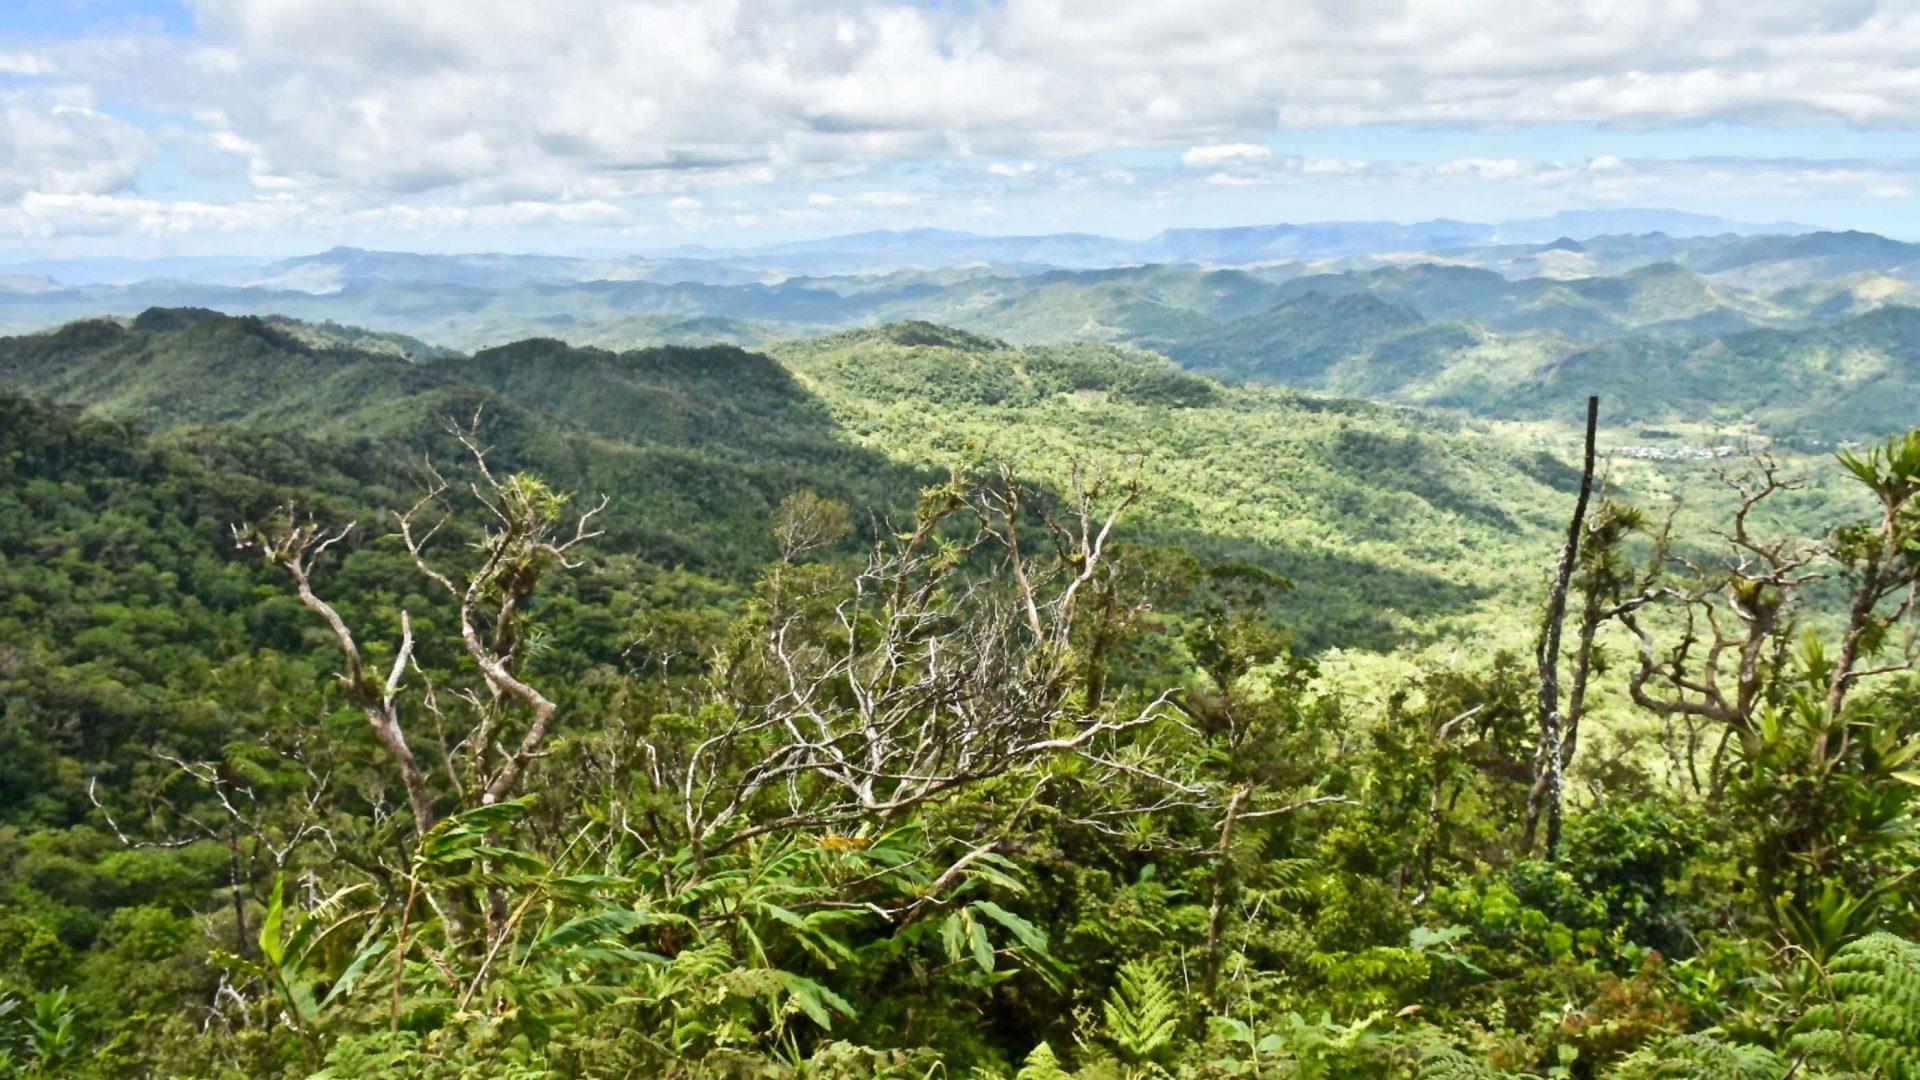 Views of a lush green landscape.